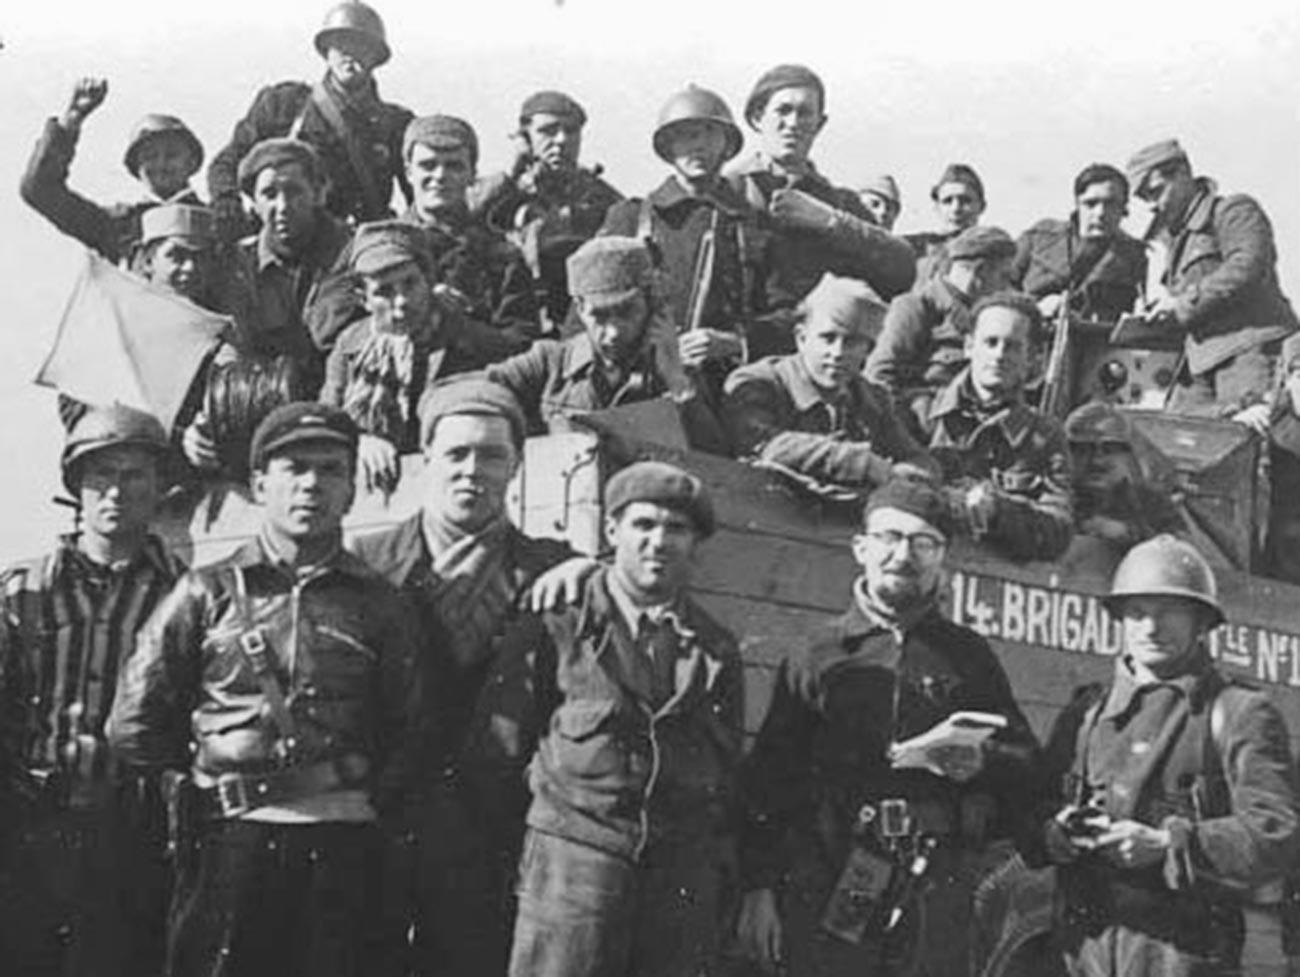 Die 14. Internationale Brigade